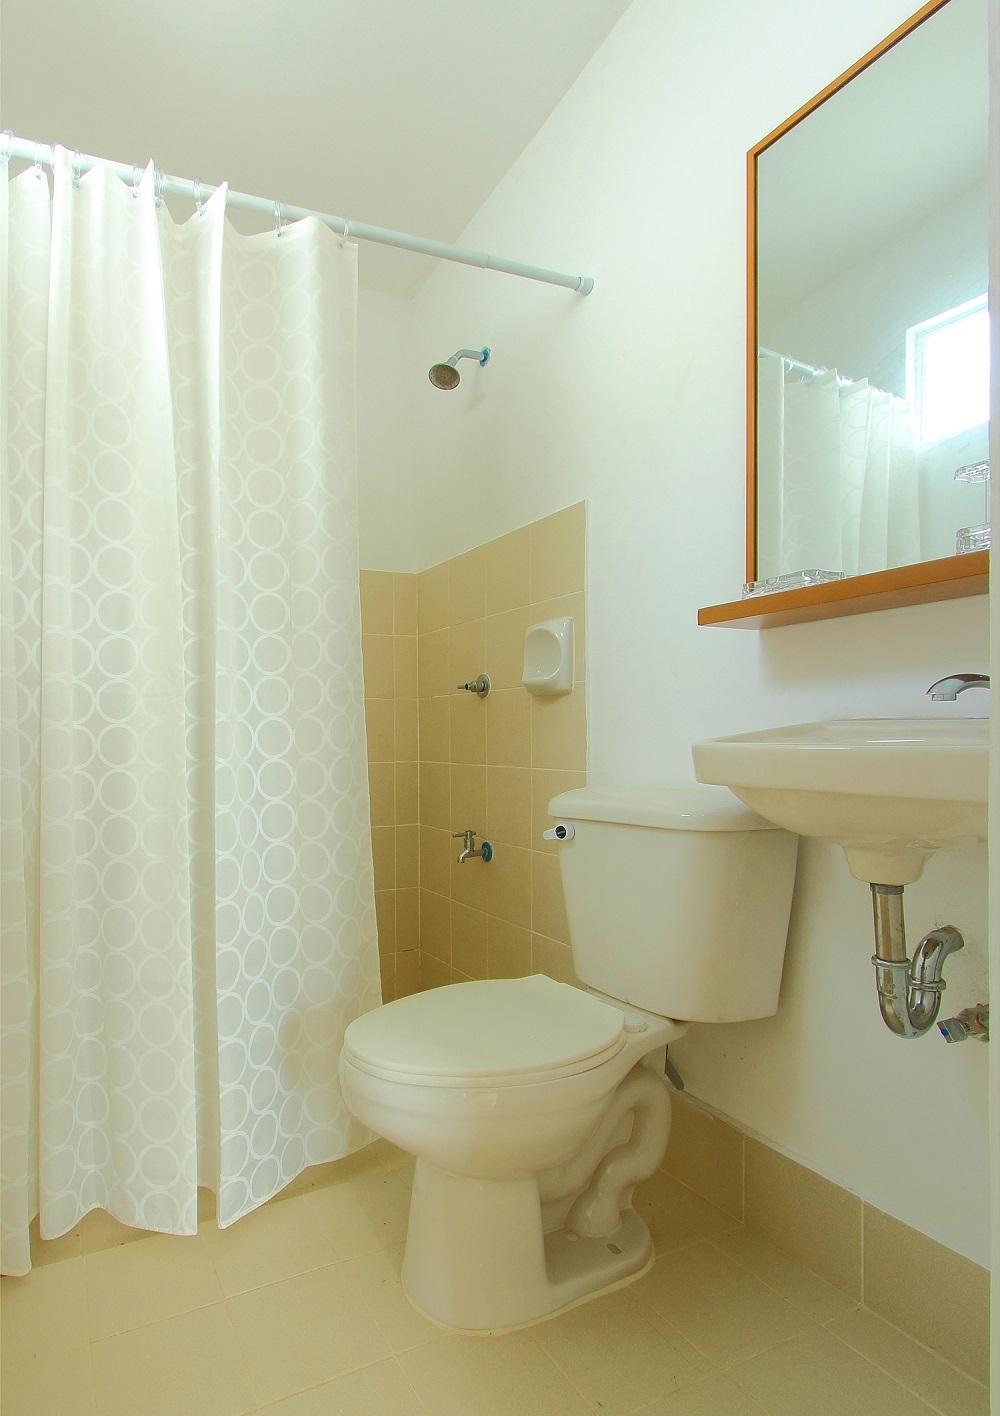 BellaVita Cabanatuan - Bathroom